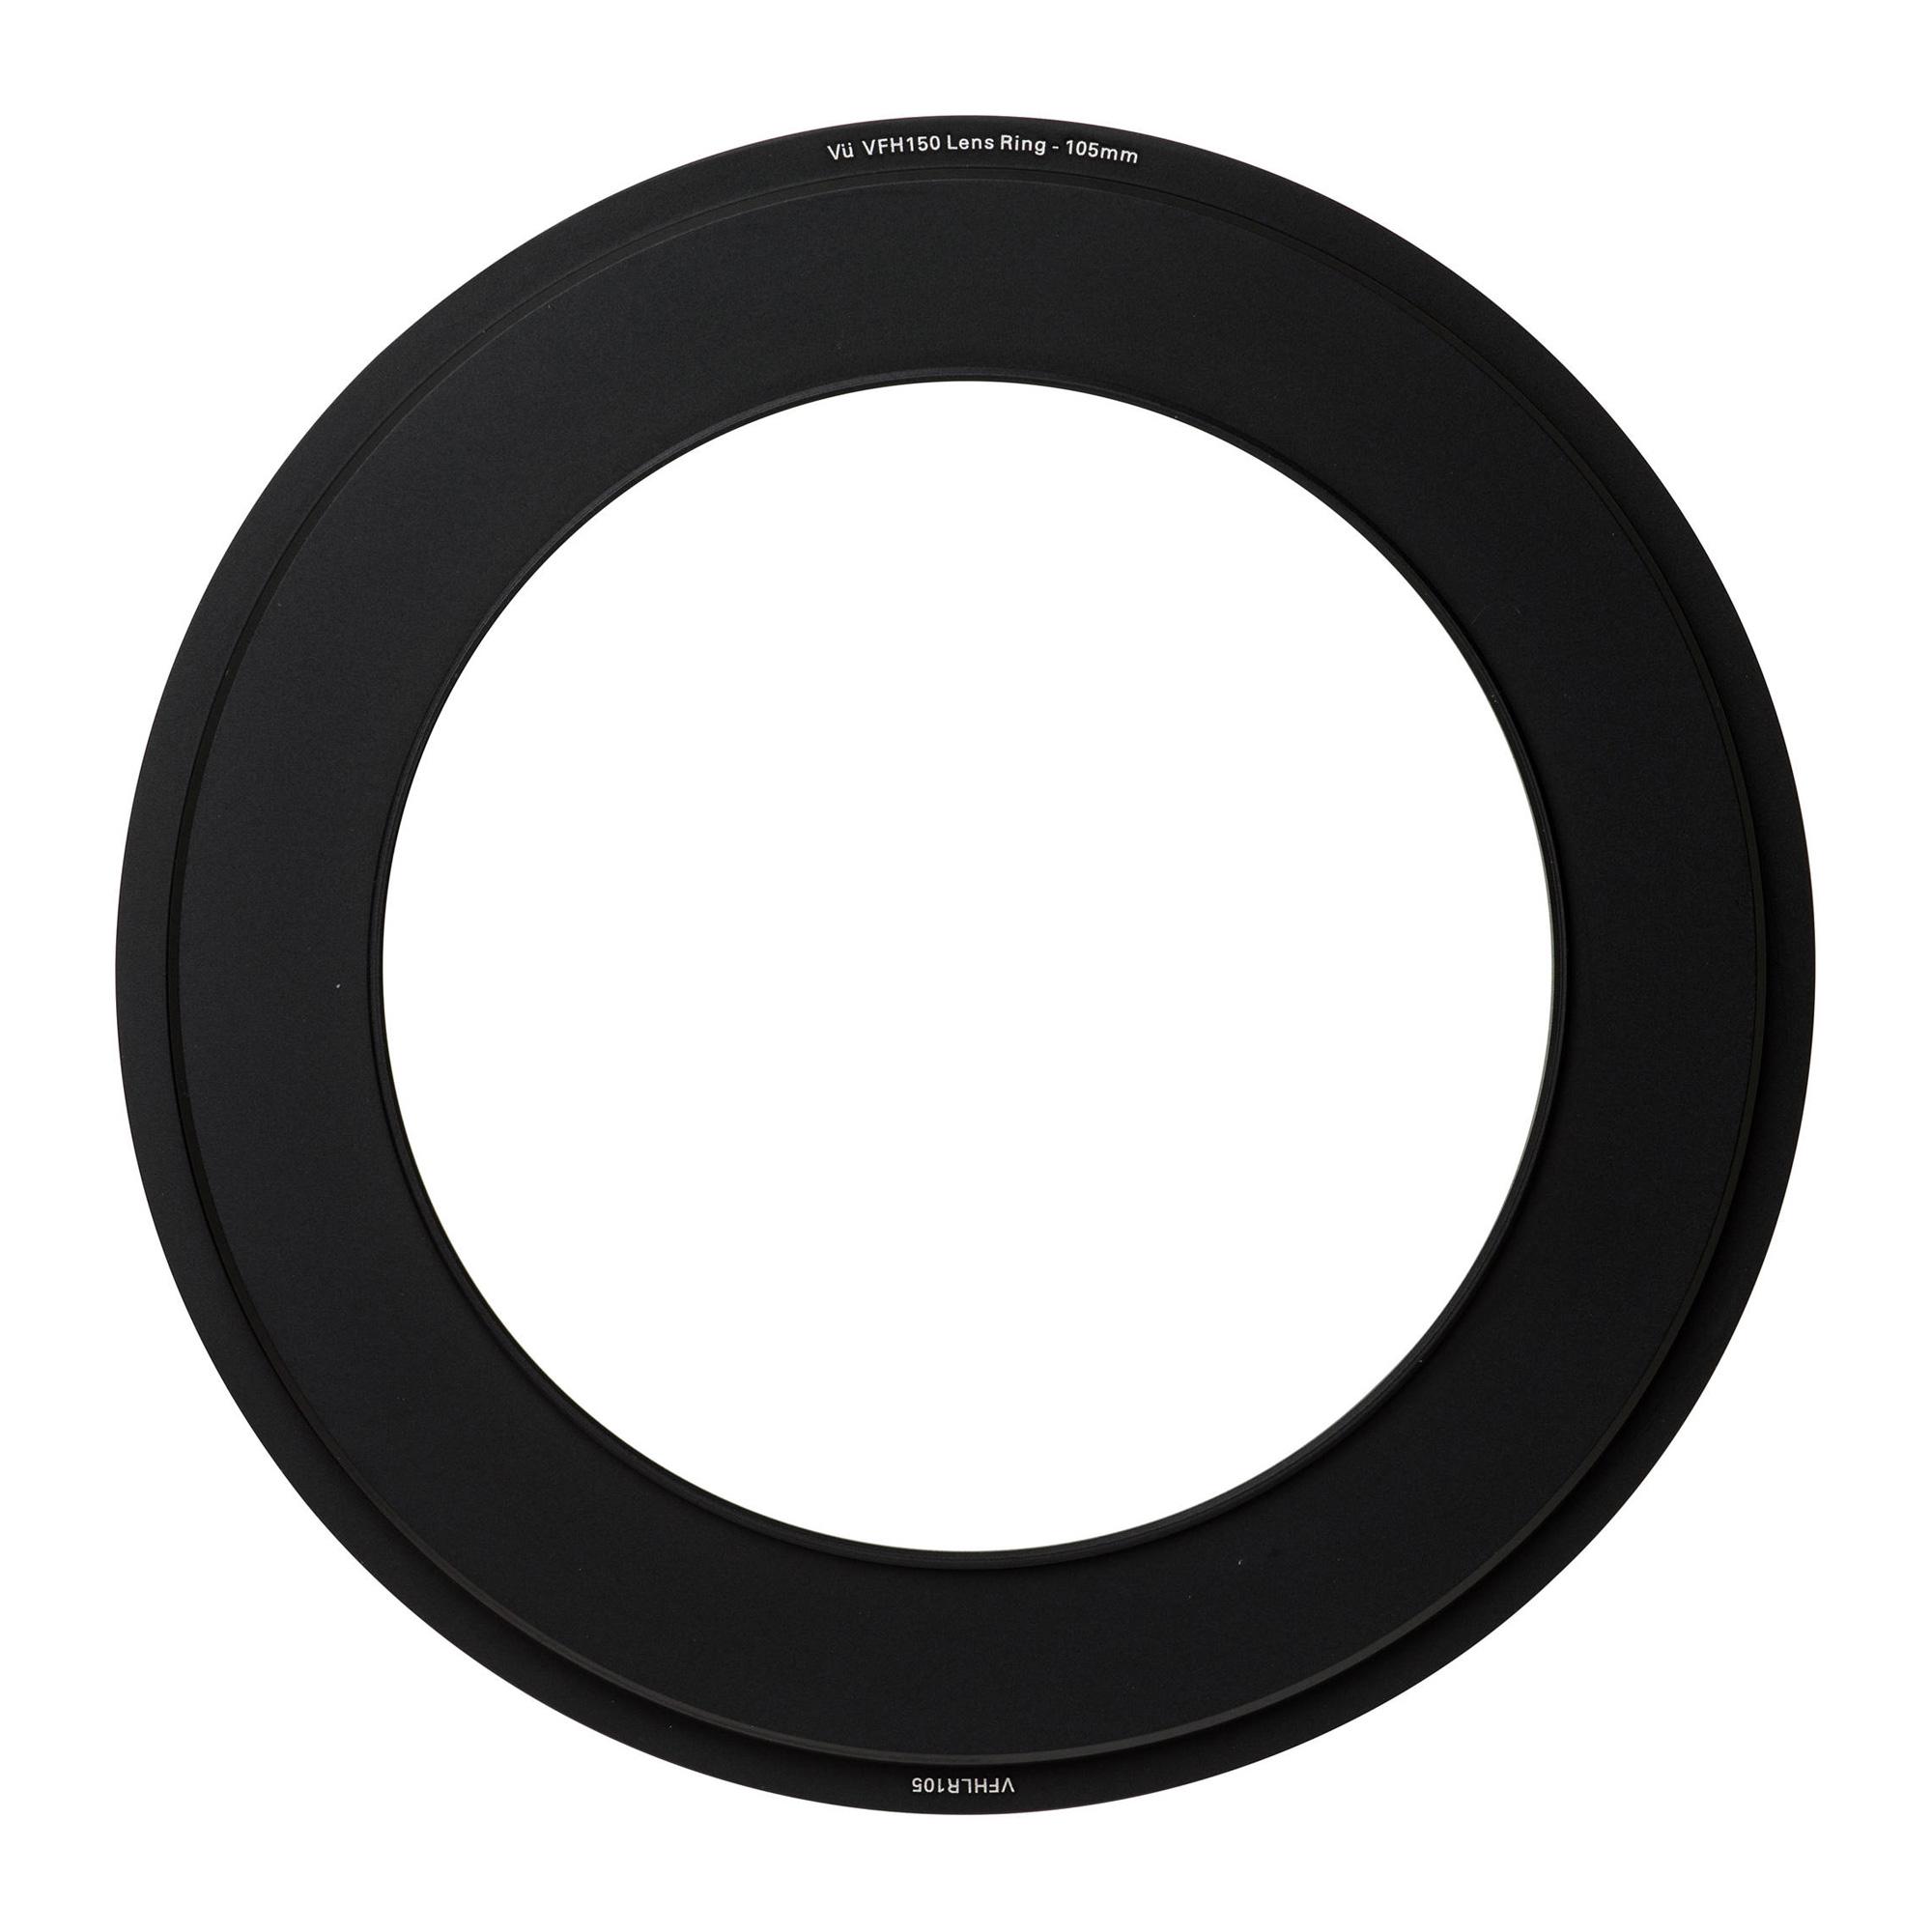 150mm Professional Filter Holder 105mm Lens Ring